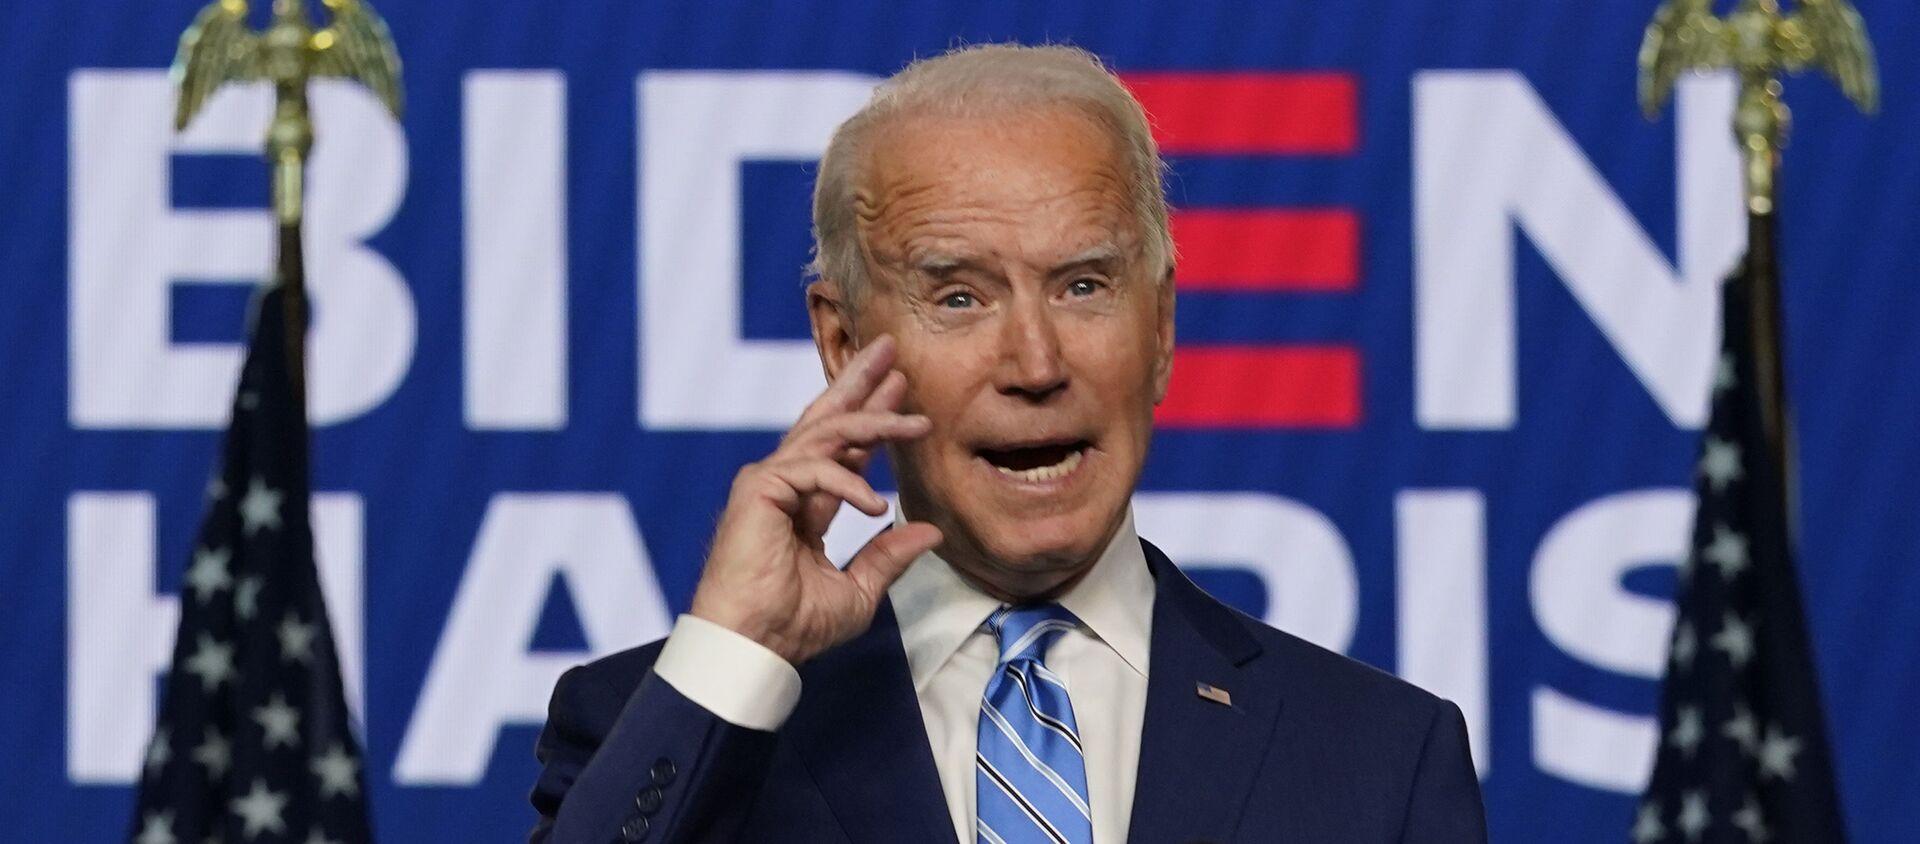 Joe Biden, presidente electo de Estados Unidos - Sputnik Mundo, 1920, 05.11.2020